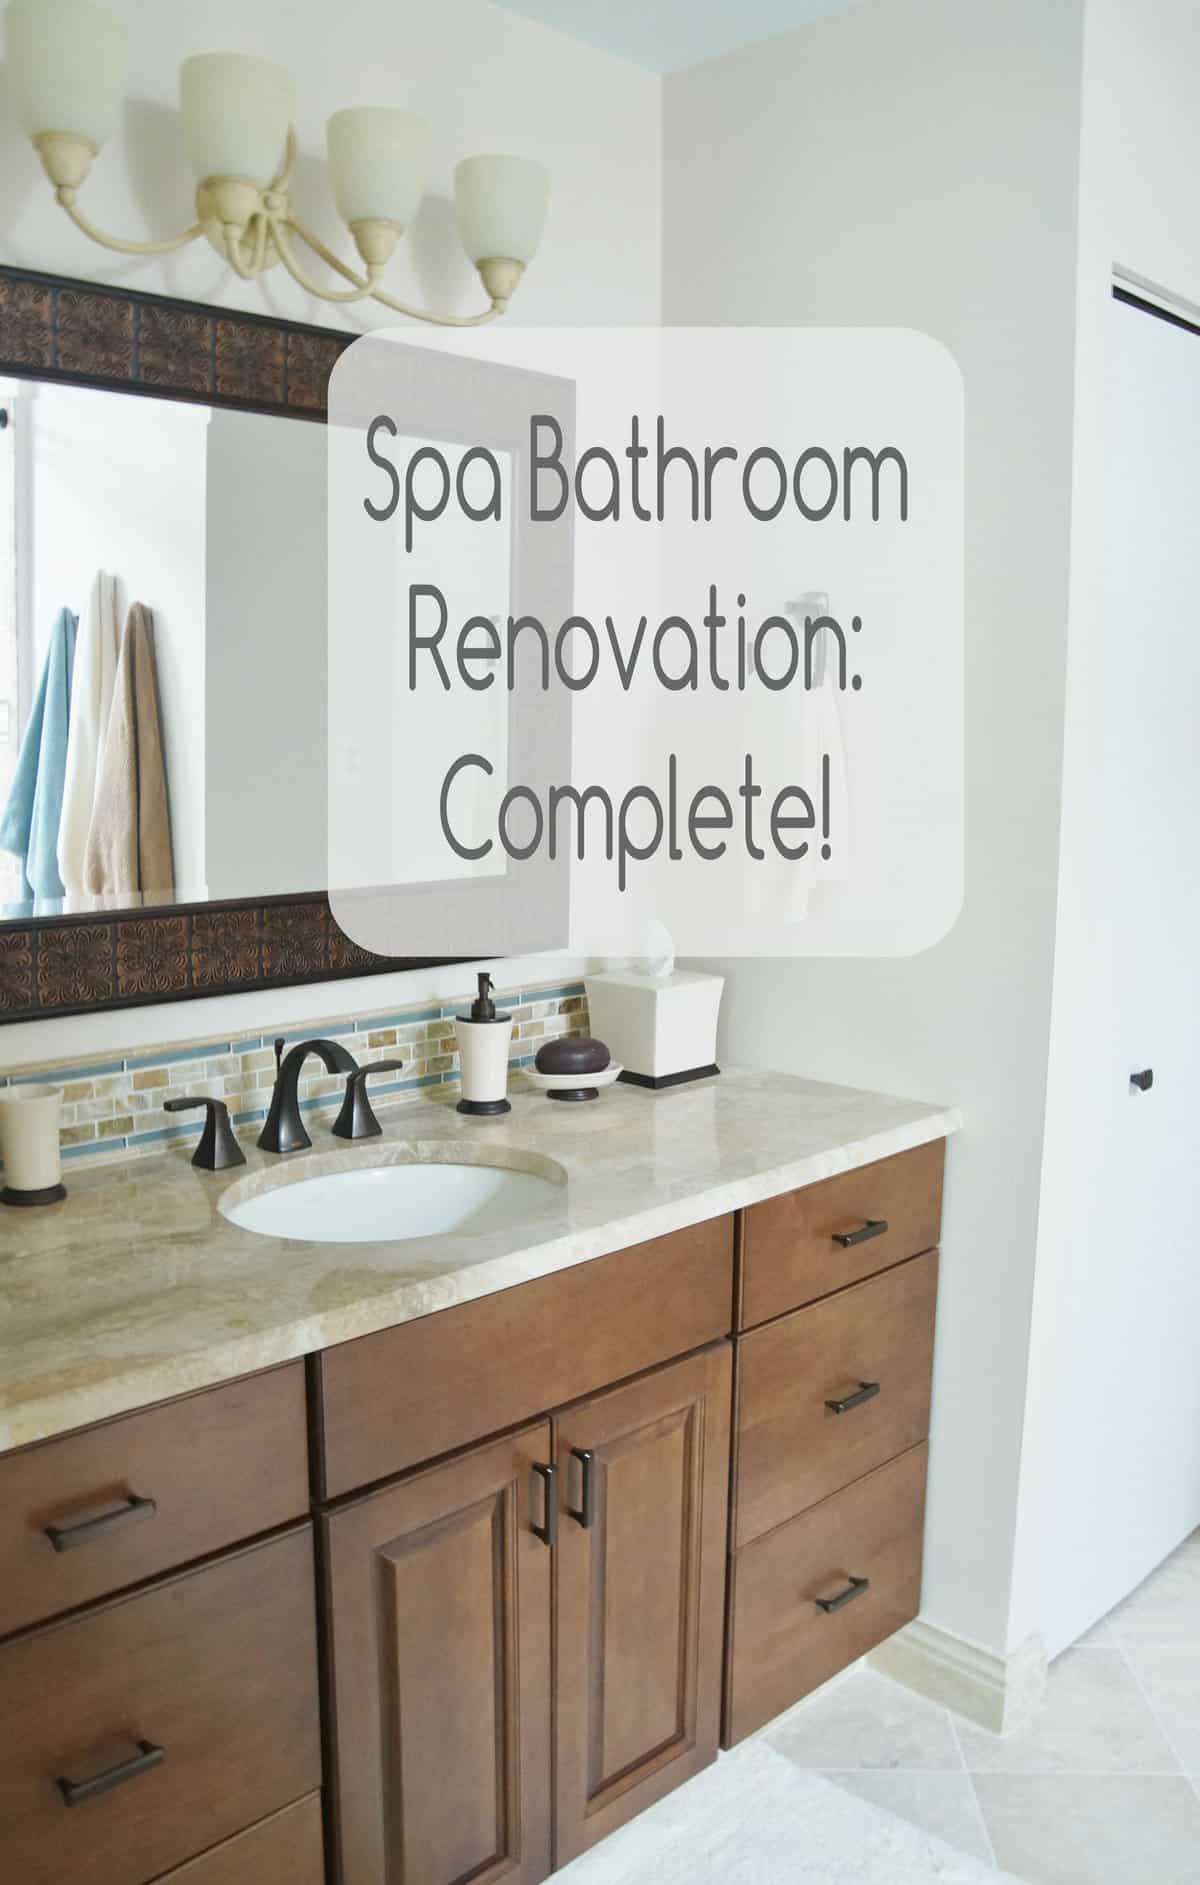 Spa Bathroom Renovation Complete